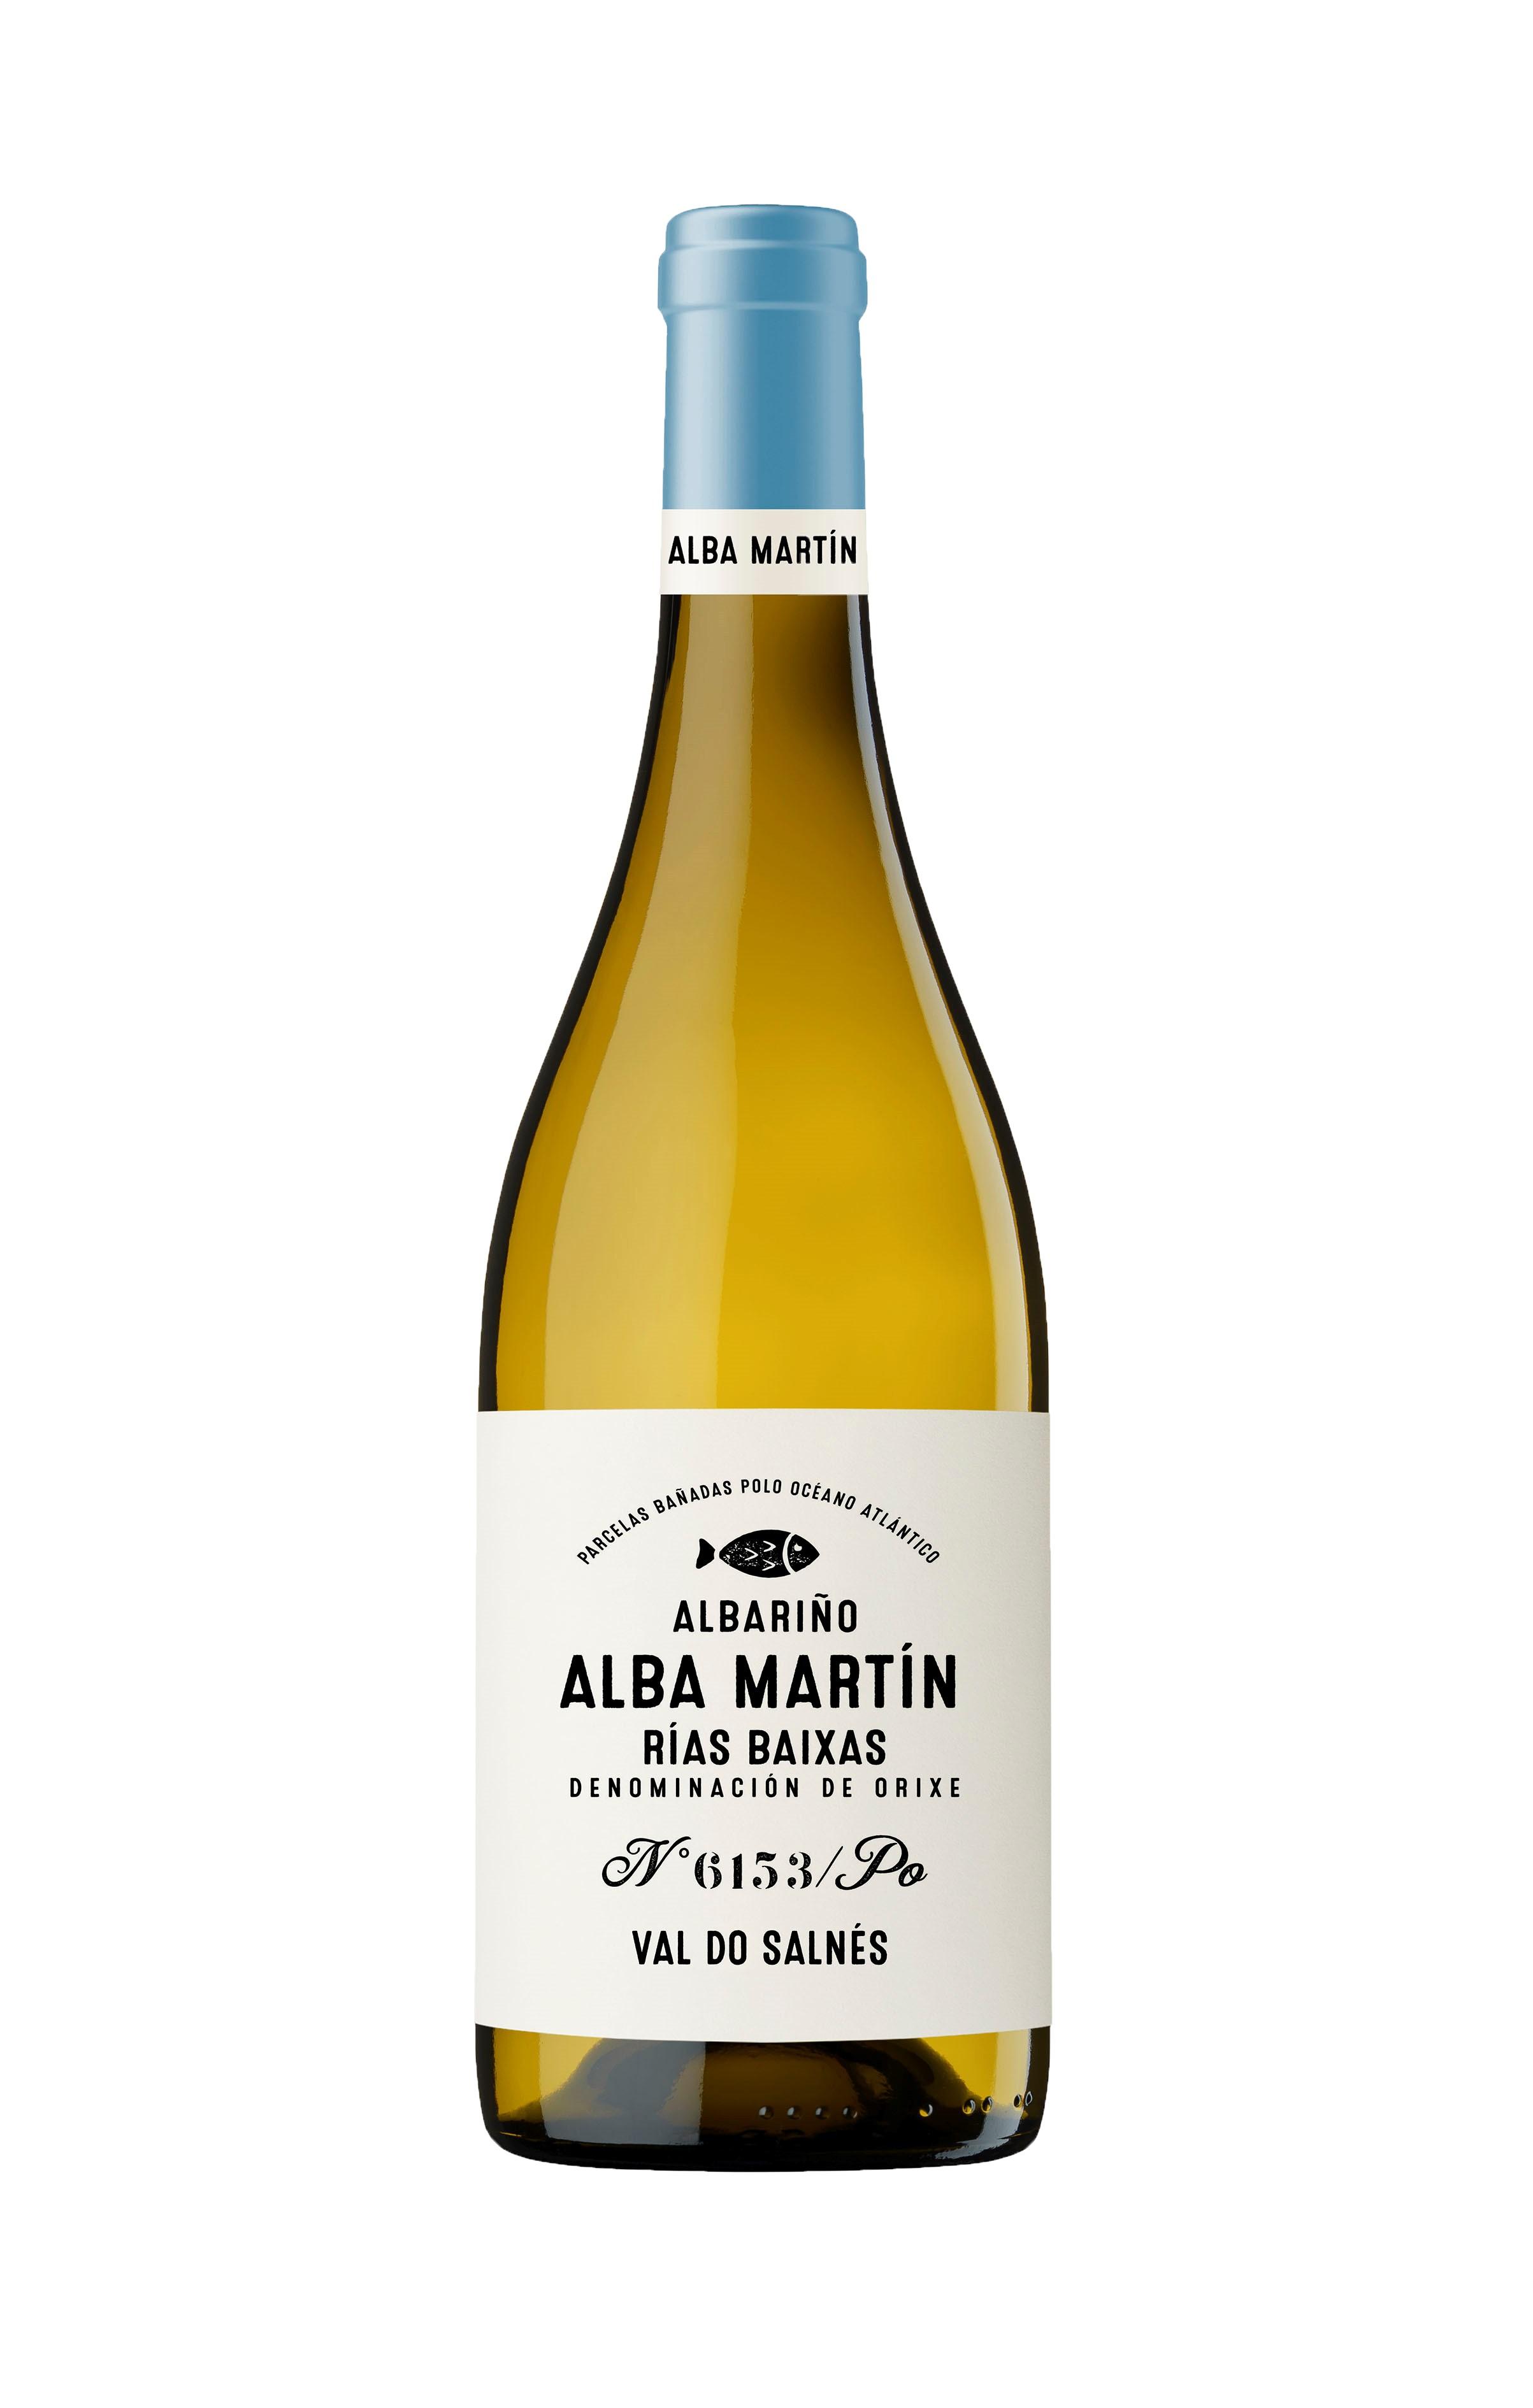 Alba Martín